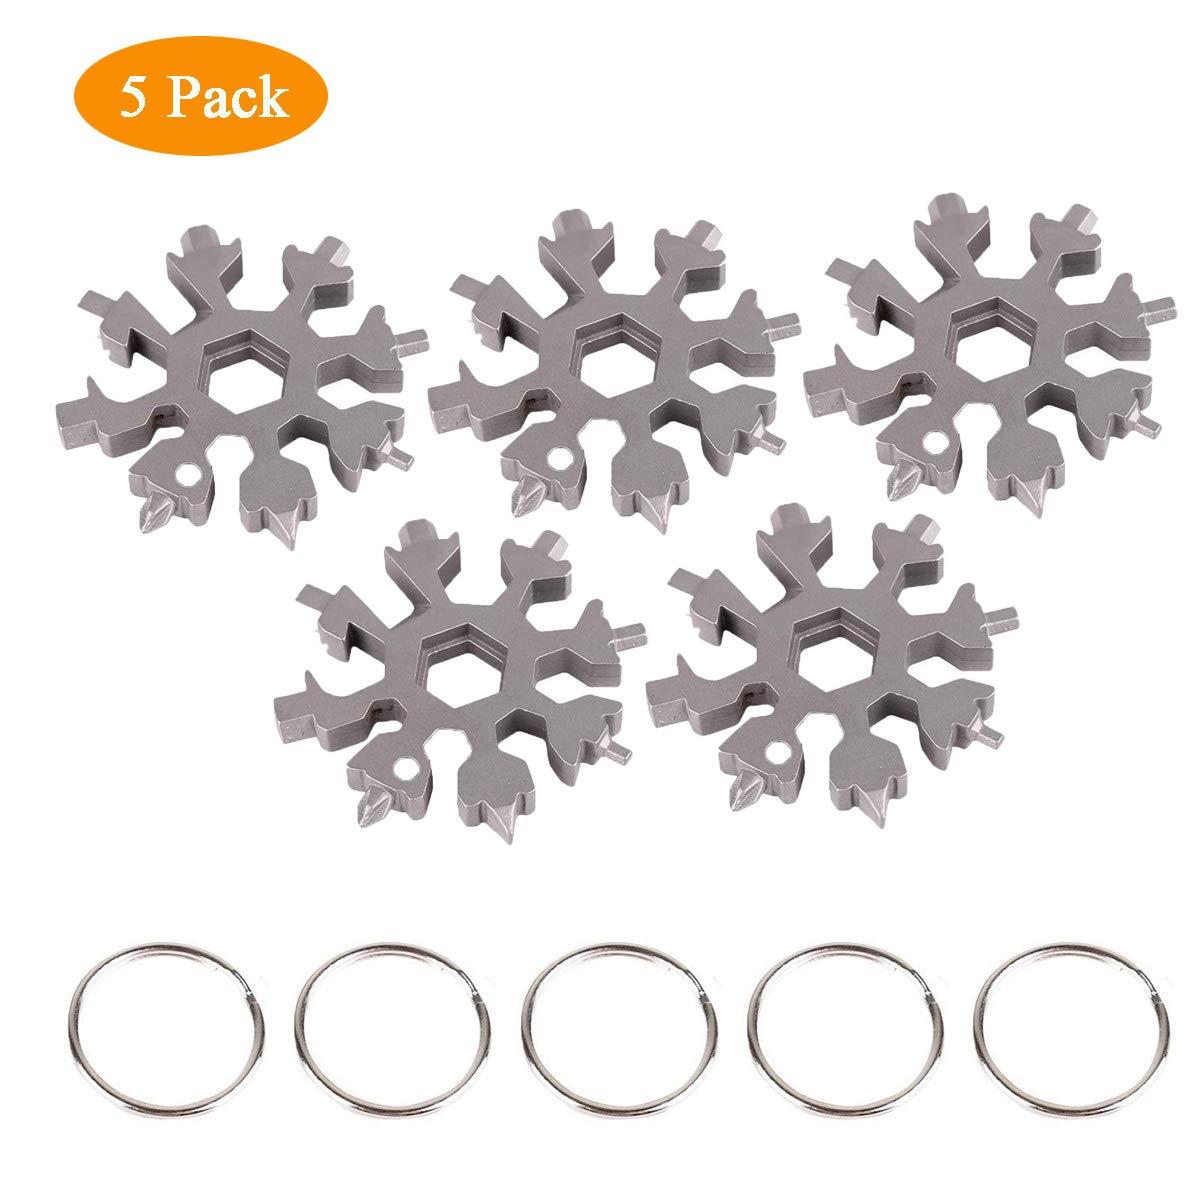 18 in 1 Stainless Steel Snowflake Multi-Tool Card Combination Snowboarding Keychain Bottle Opener Snowflake Tool Card Meelino